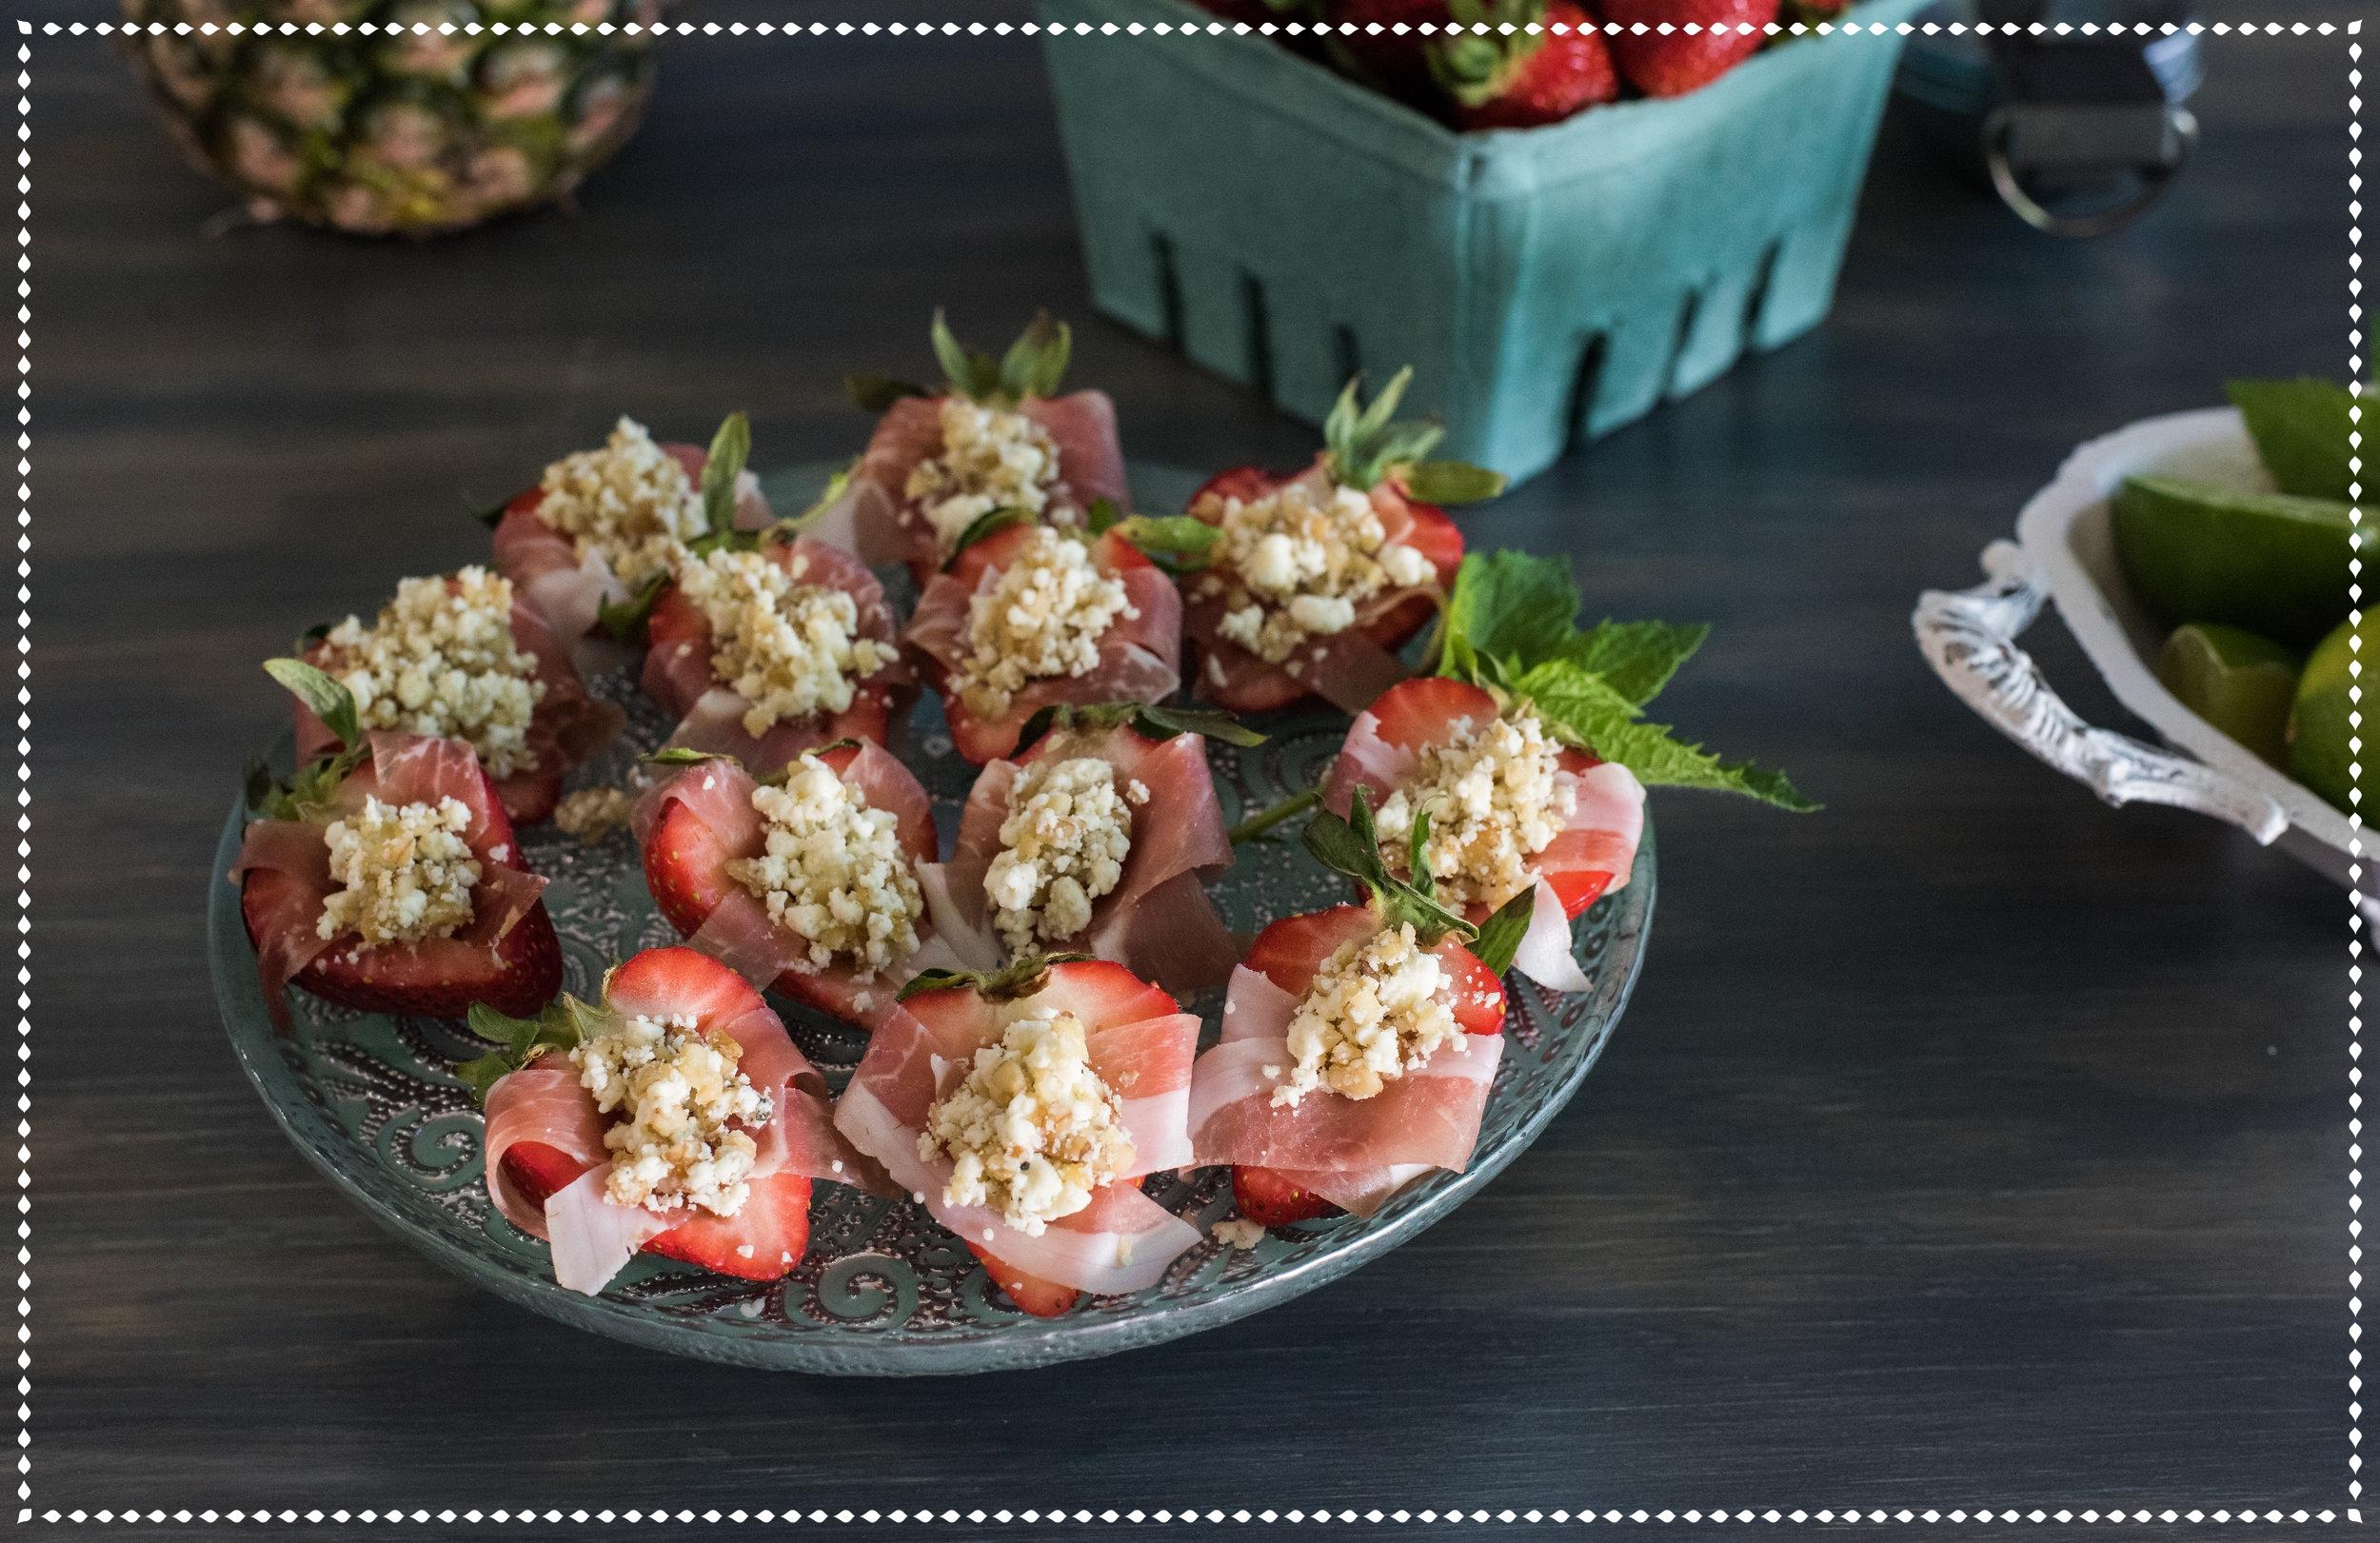 Blue Cheese Stuffed Strawberries